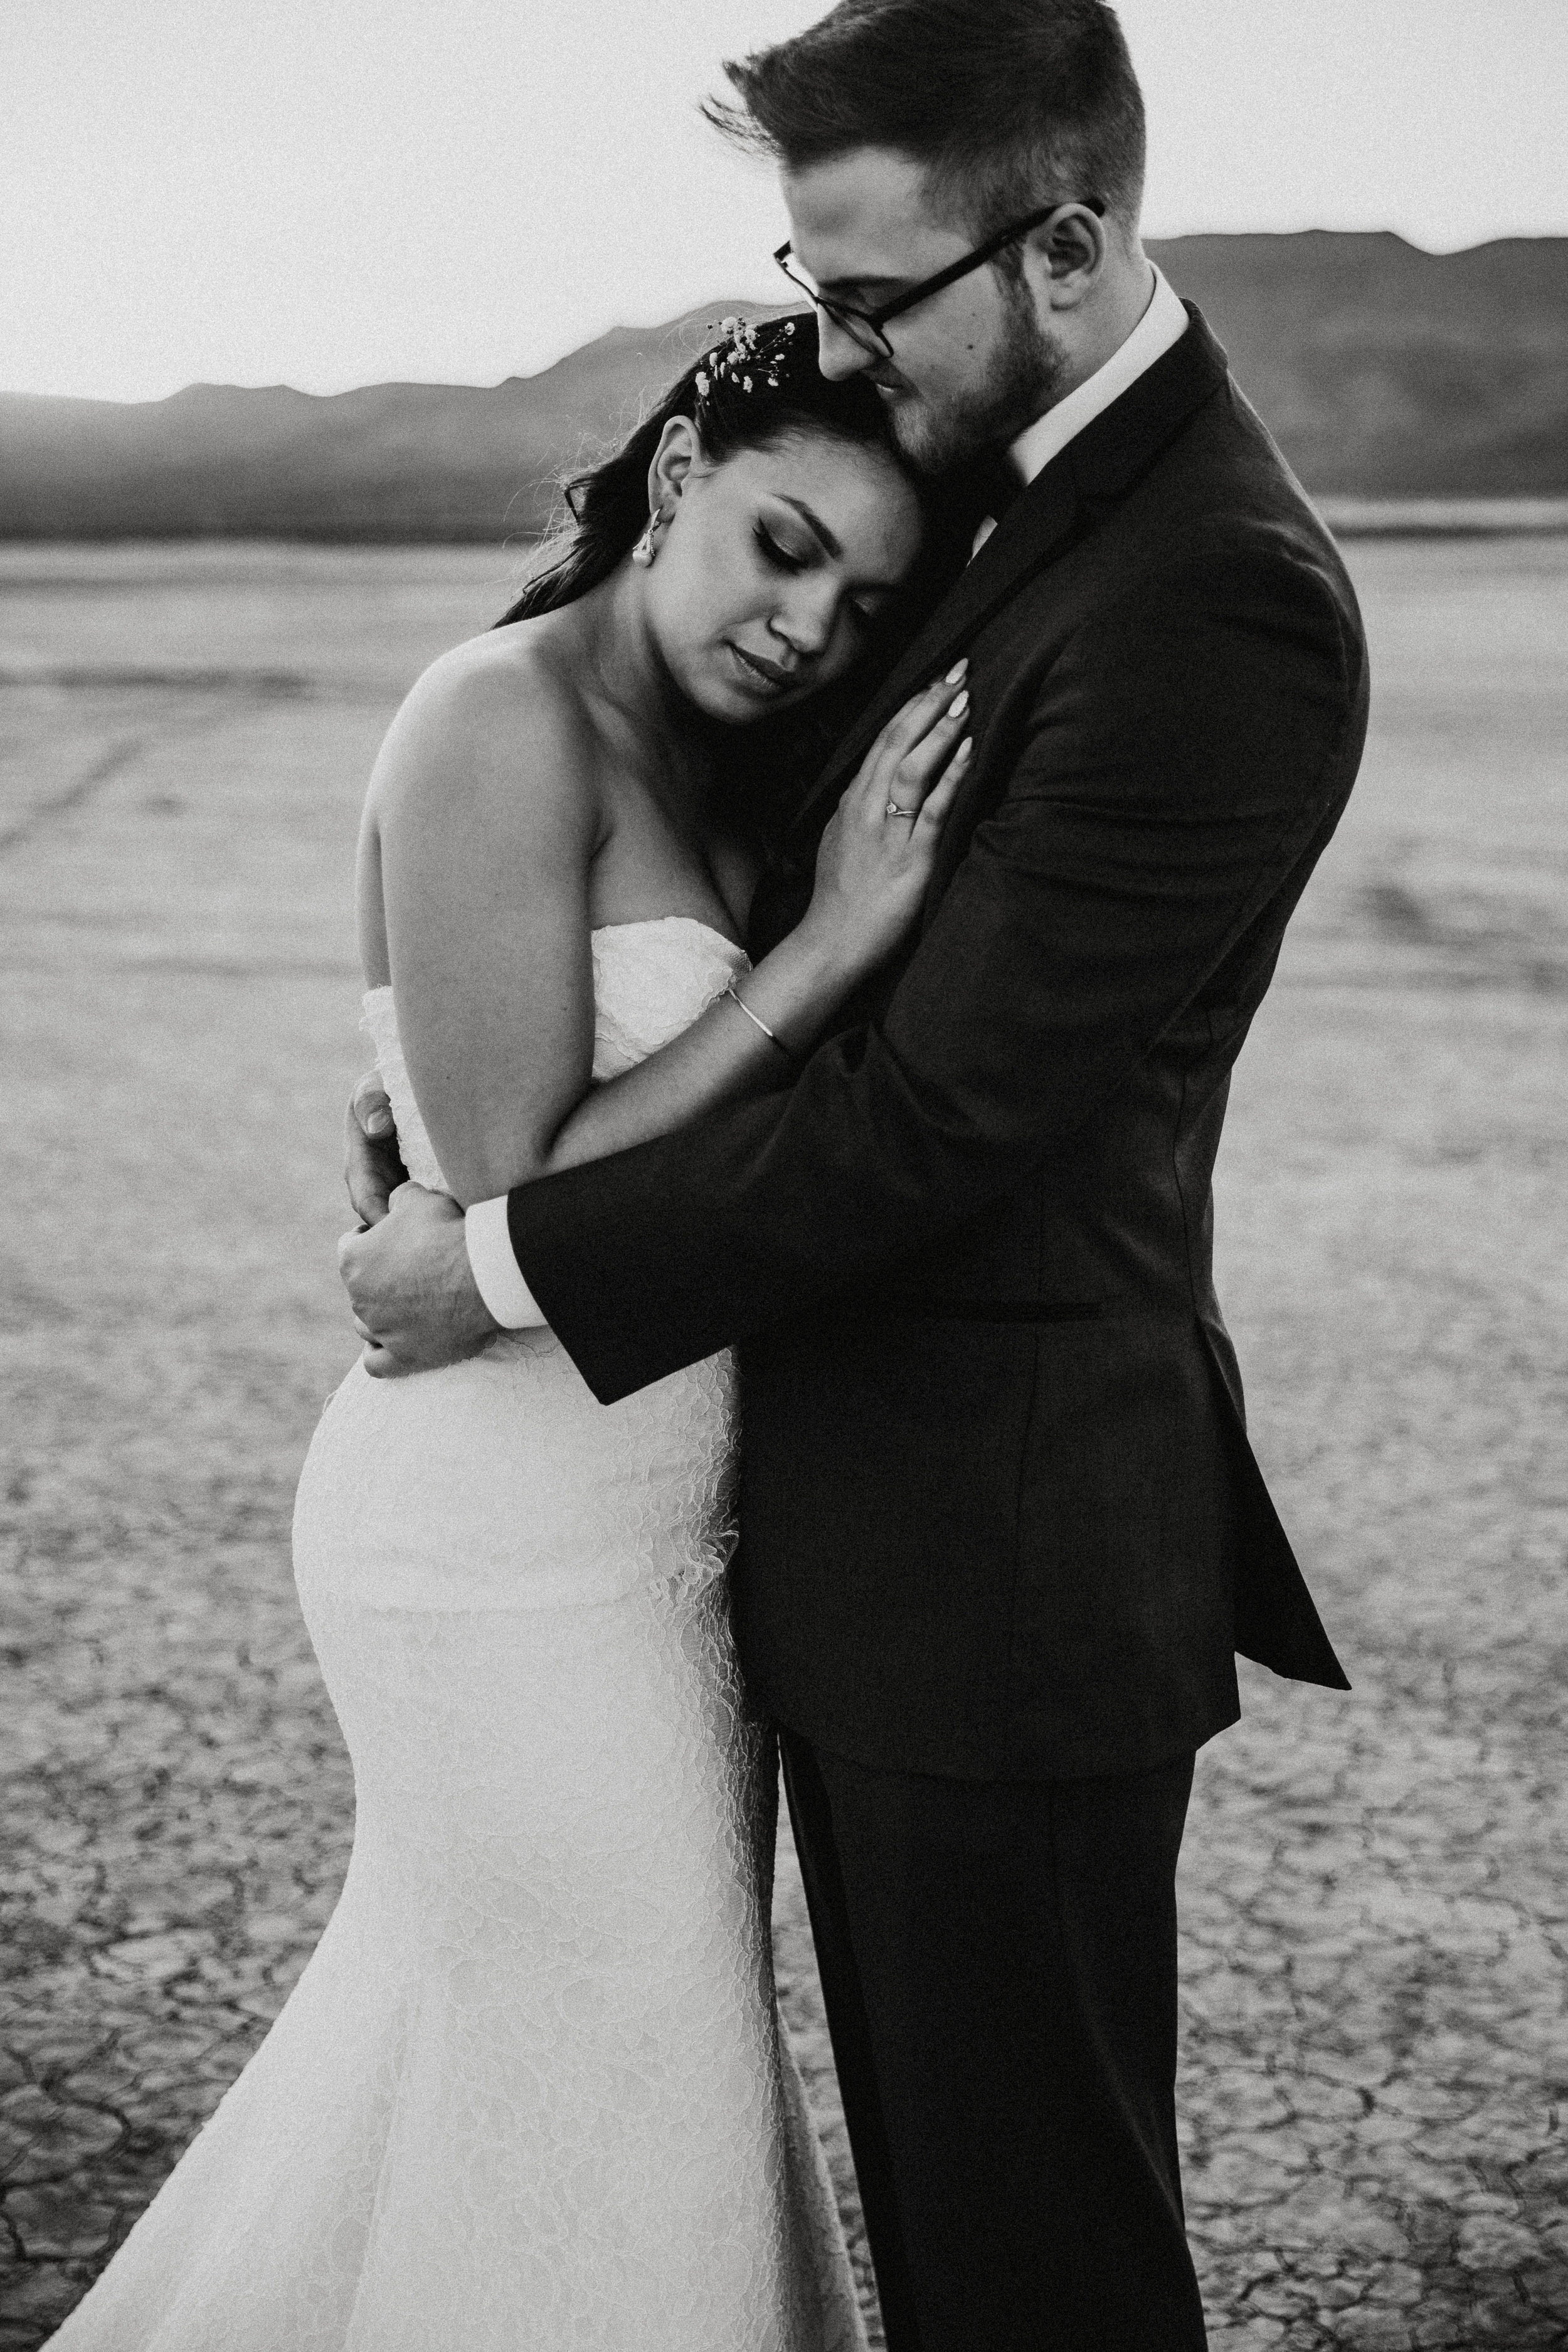 Jessica + Daniel - Las Vegas Wedding Photography - Seattle Wedding Photographer - PNW Wedding Photographer - First Look - Portrait Session